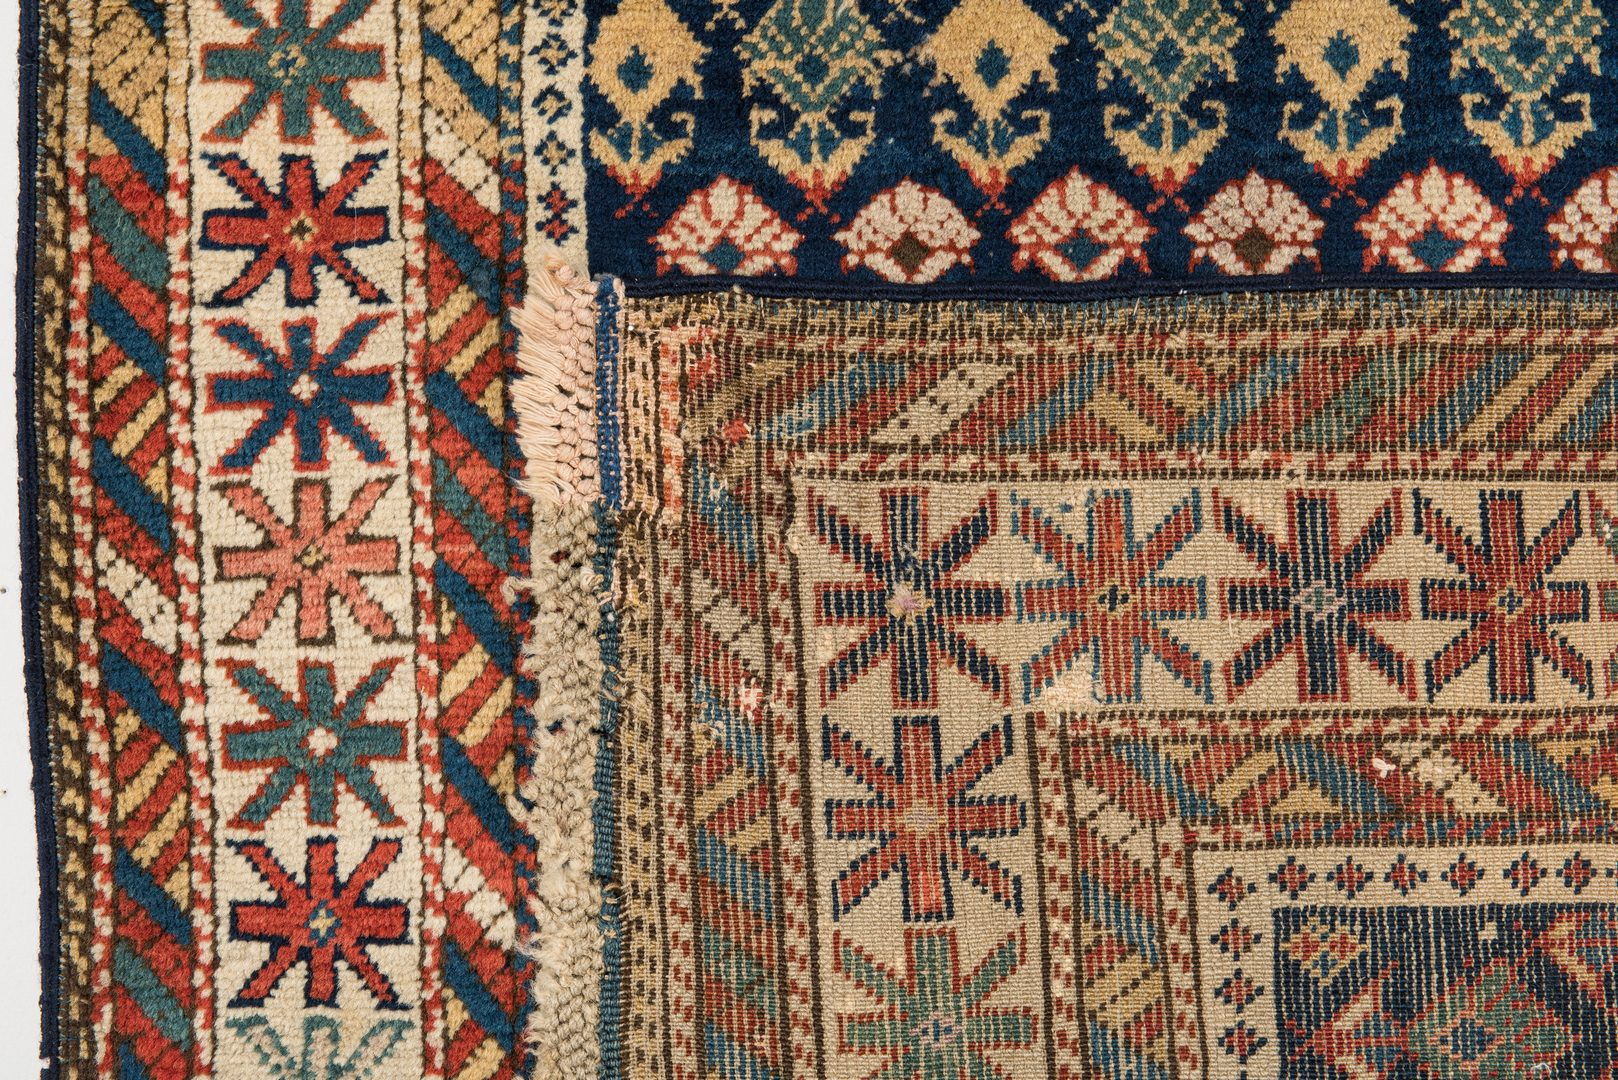 Lot 391: Antique Kuba Caucasian area rug